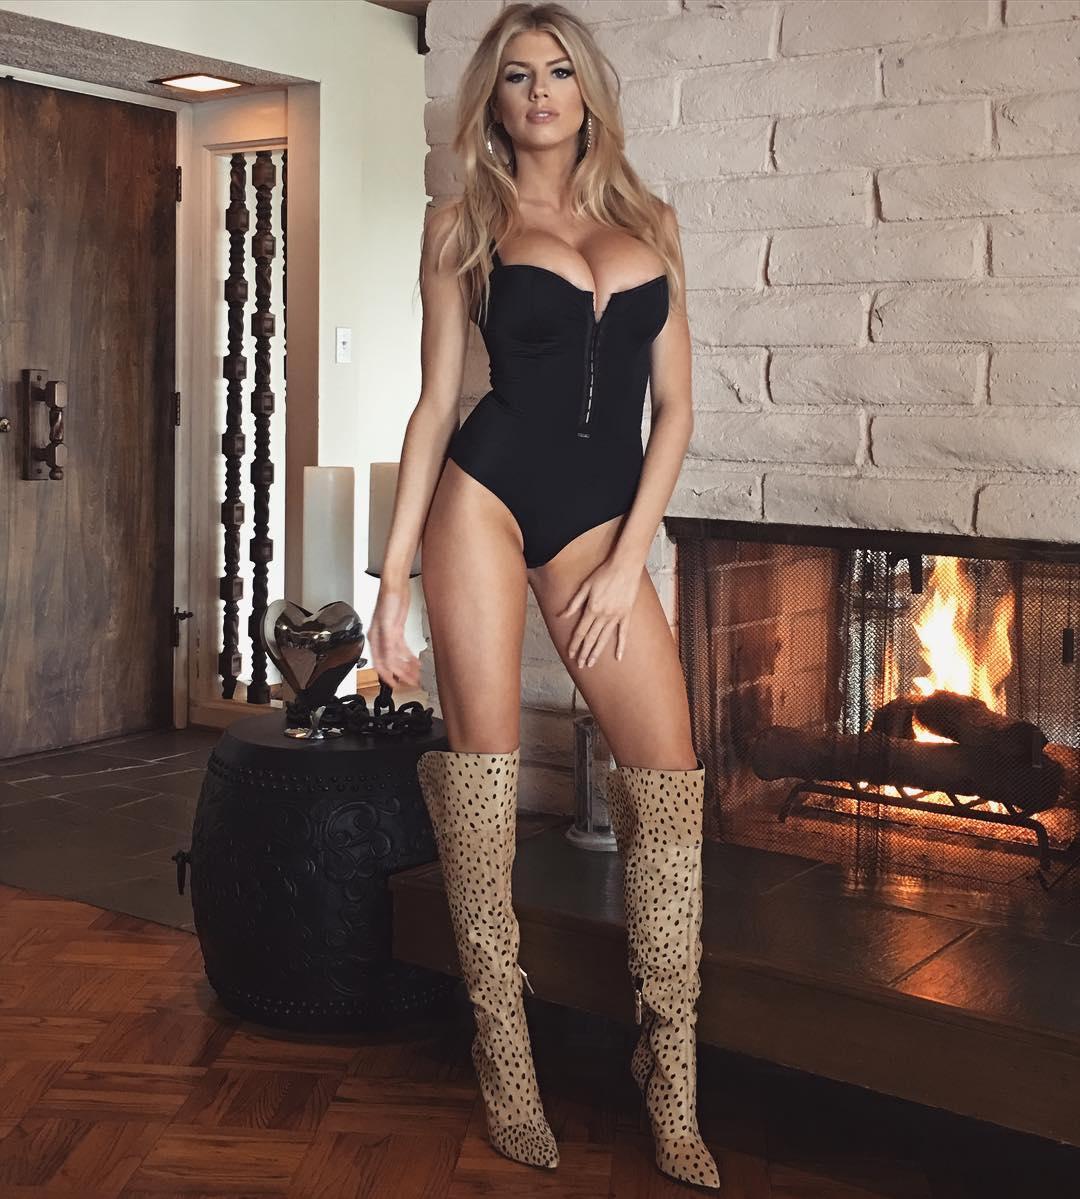 charlotte-mckinney-bikini-pics-are-so-hot-1